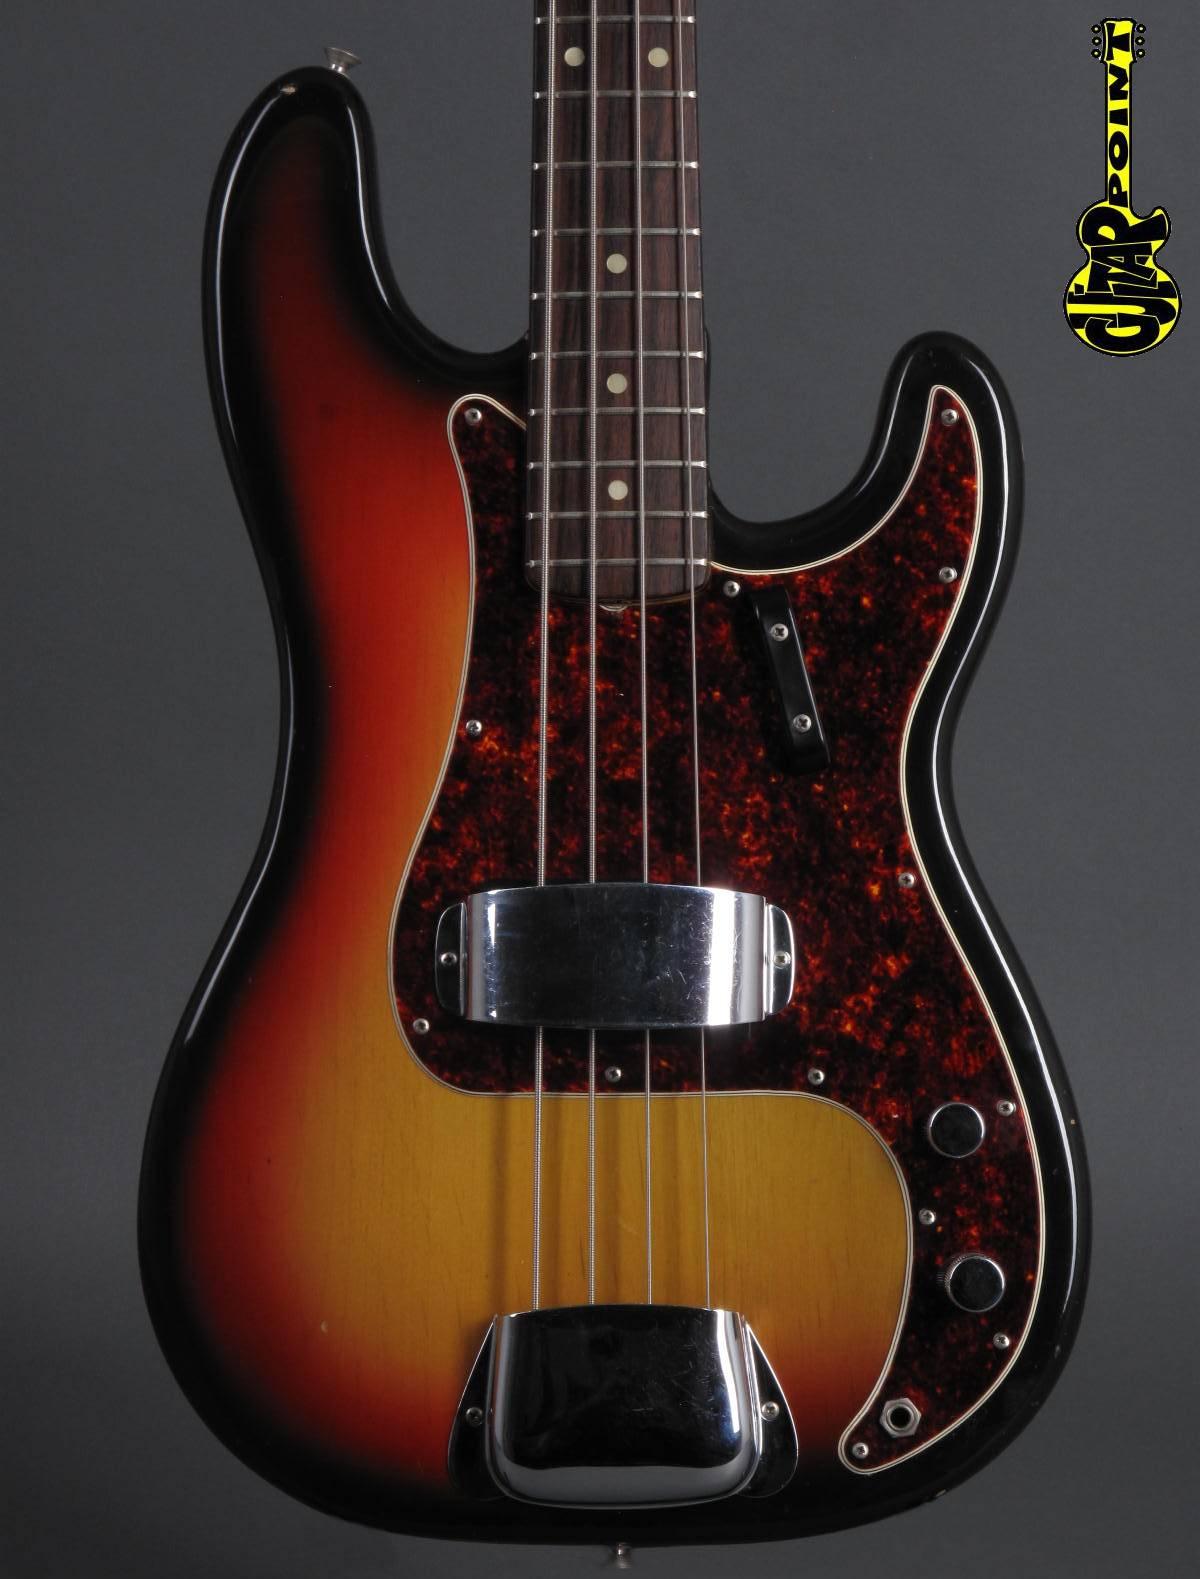 1971 Fender Precision Bass - 3t-Sunburst